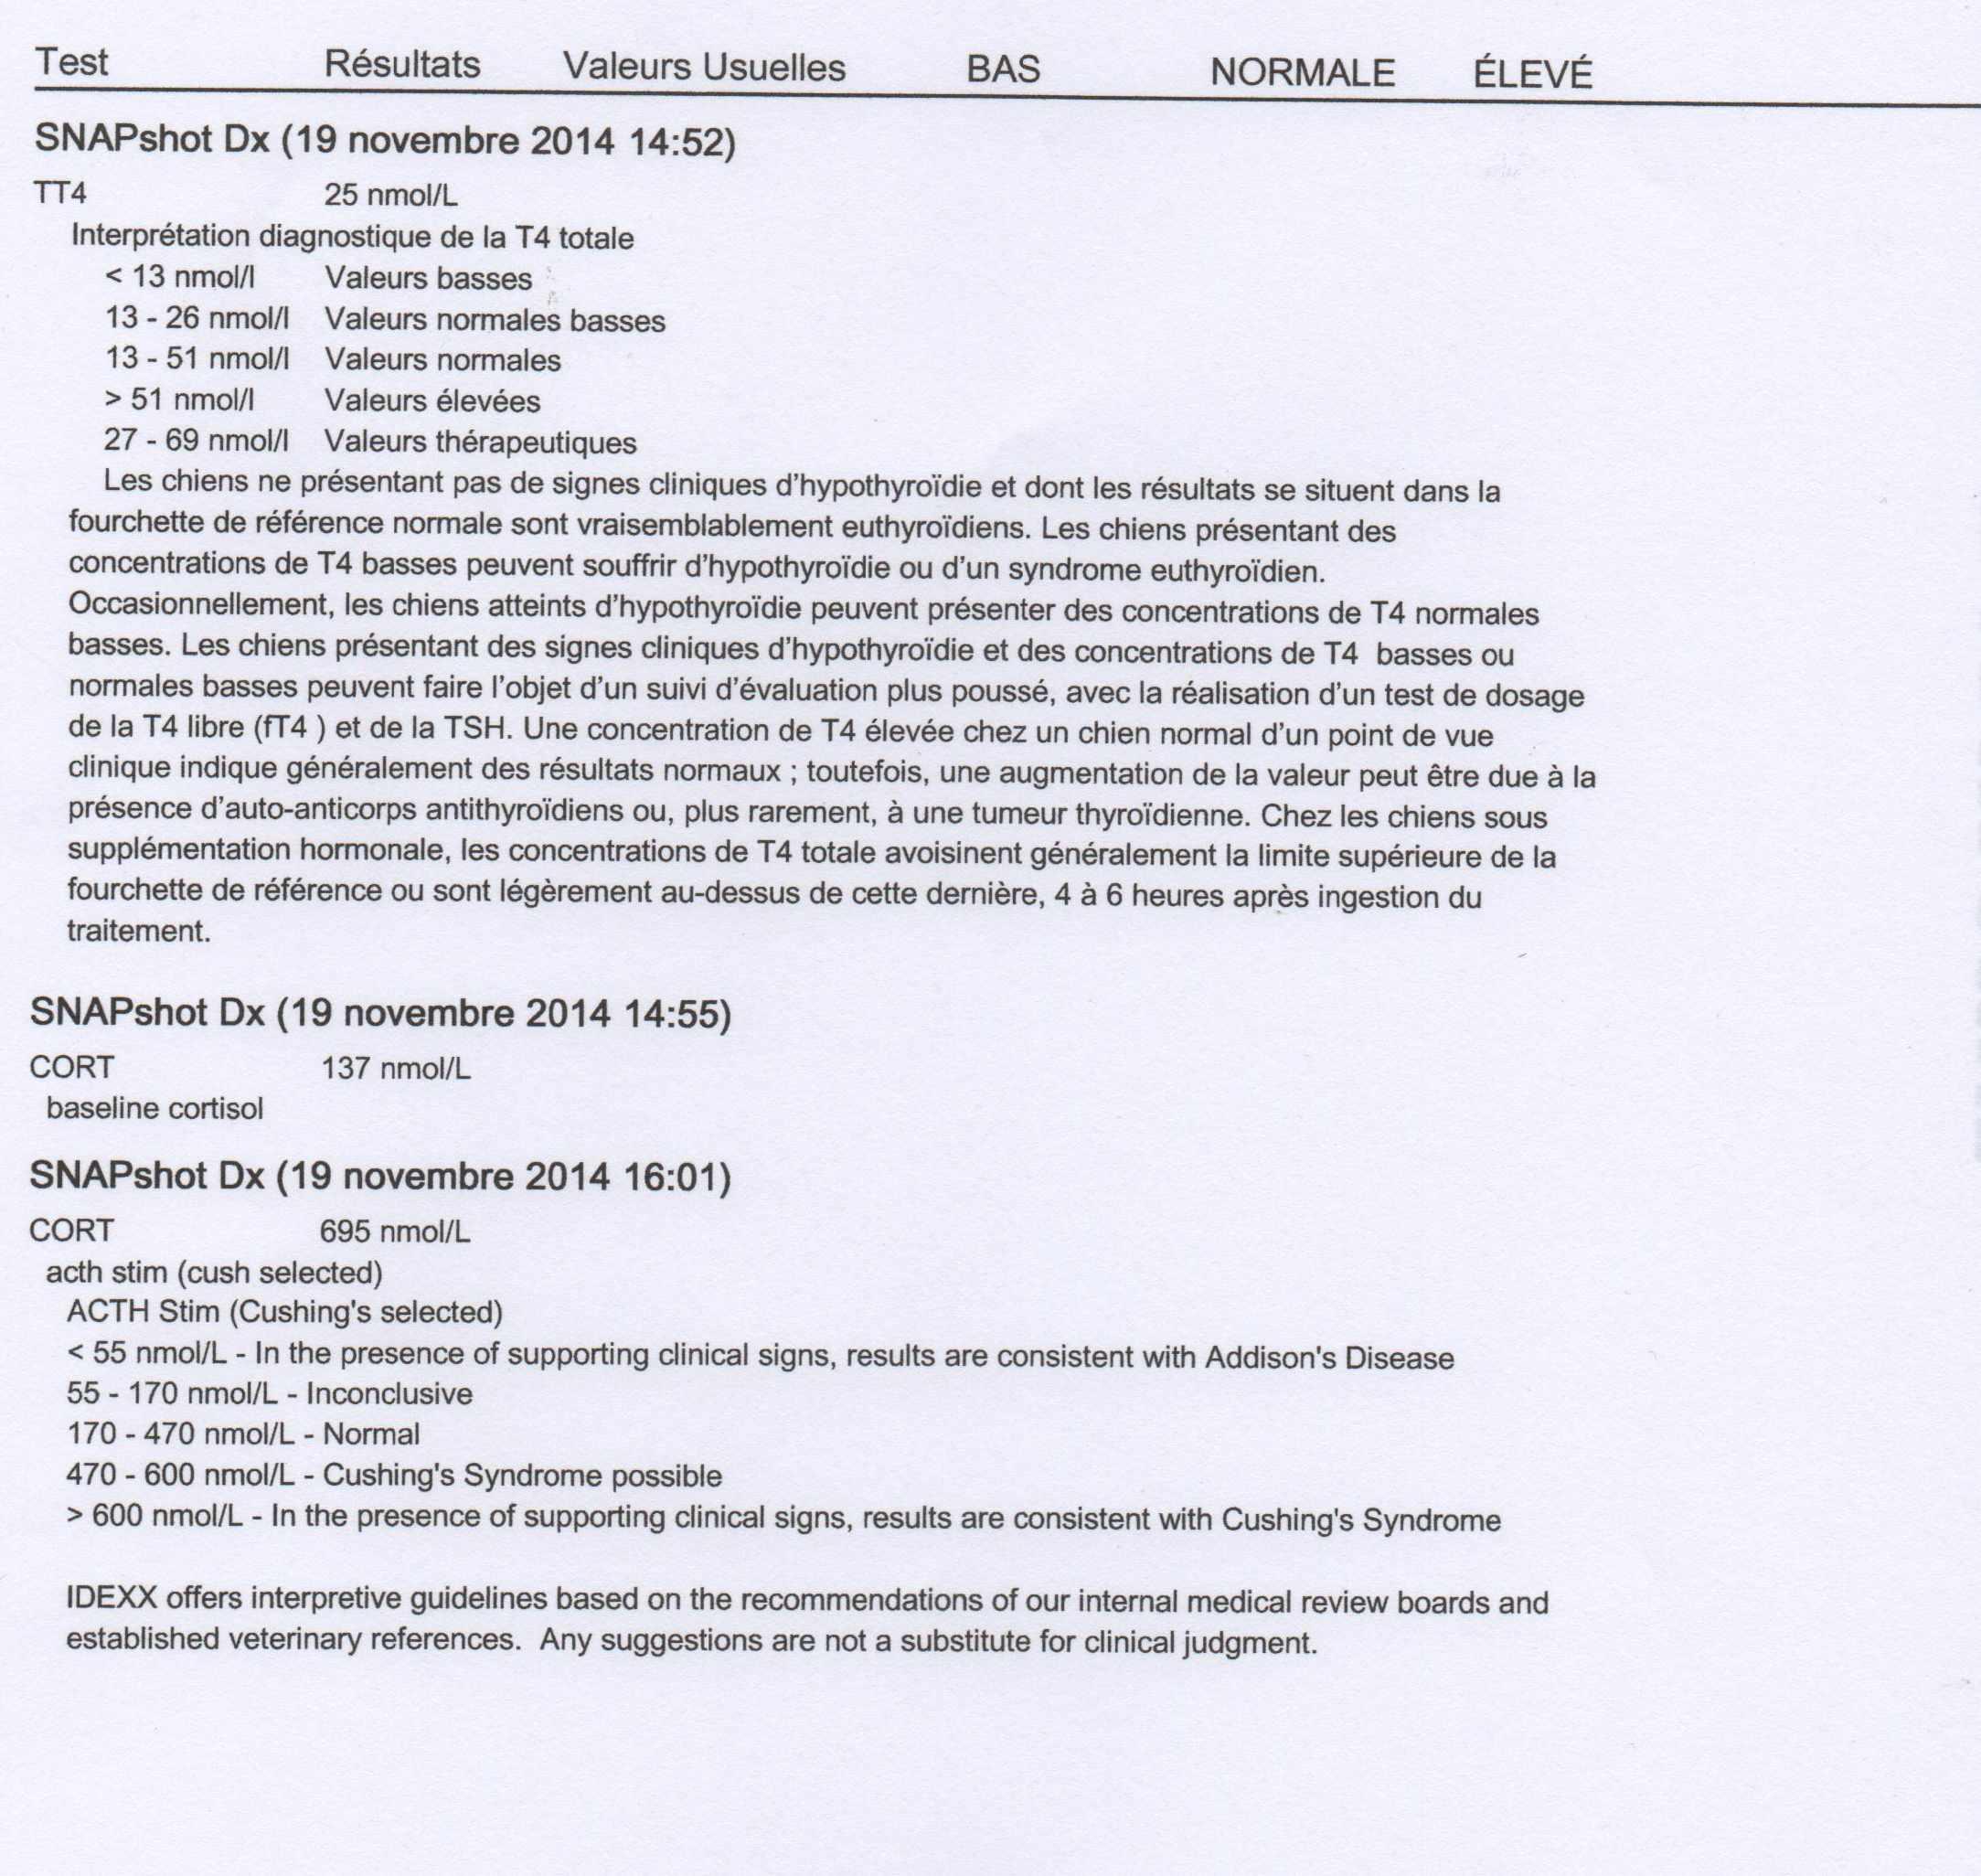 Résultat d'analyse concernant le syndrome de Cushing.